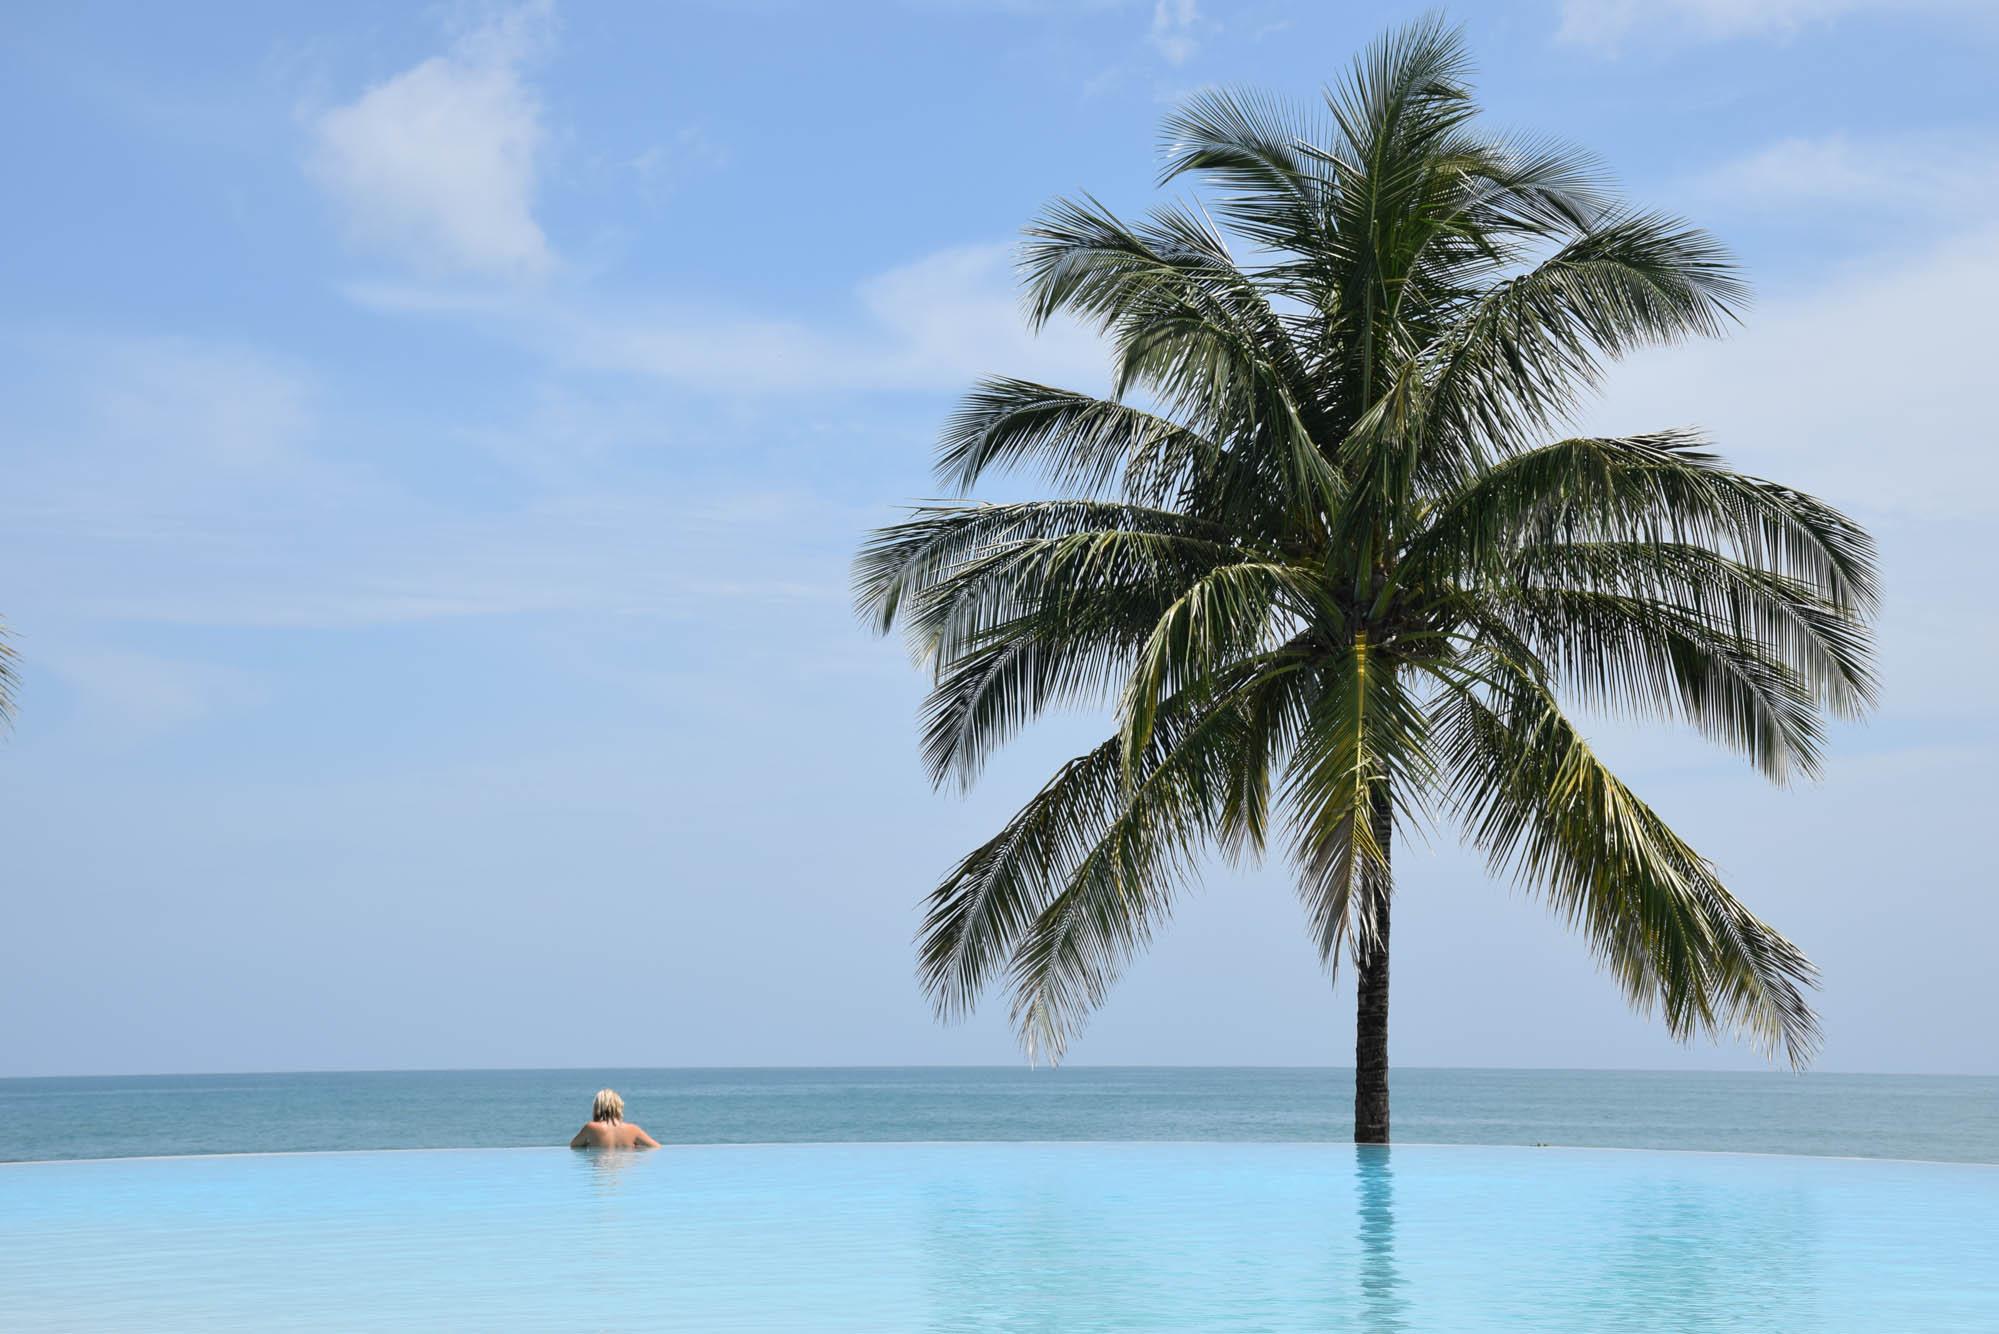 Pedasi-Isla-Iguana-Panama-Andromeda-Playa-Venao-LalaRebelo_0493